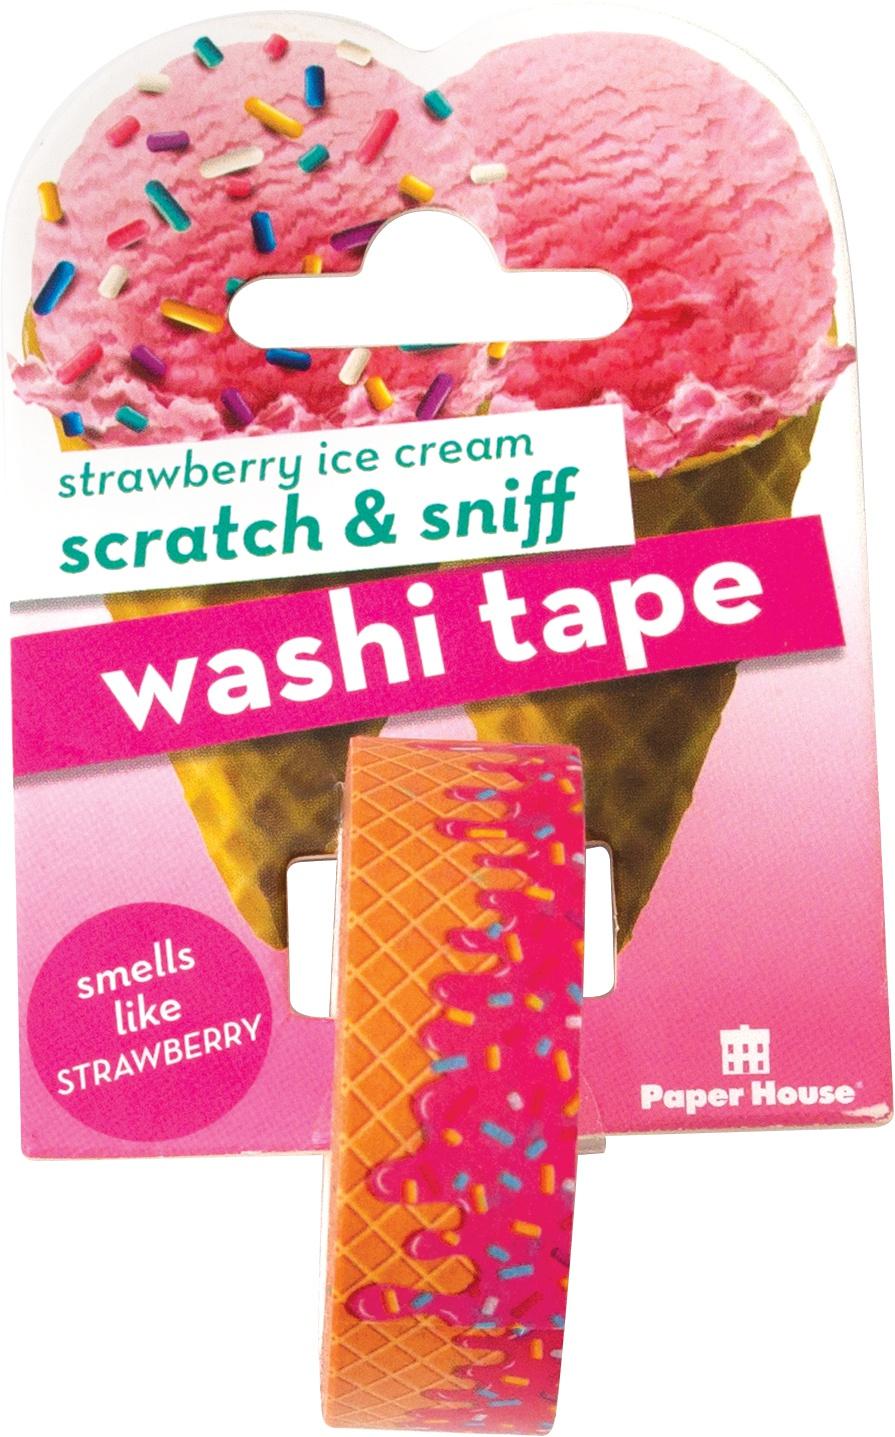 Paper House Scratch & Sniff Washi Tape-Strawberry Ice Cream, 15mmX8m